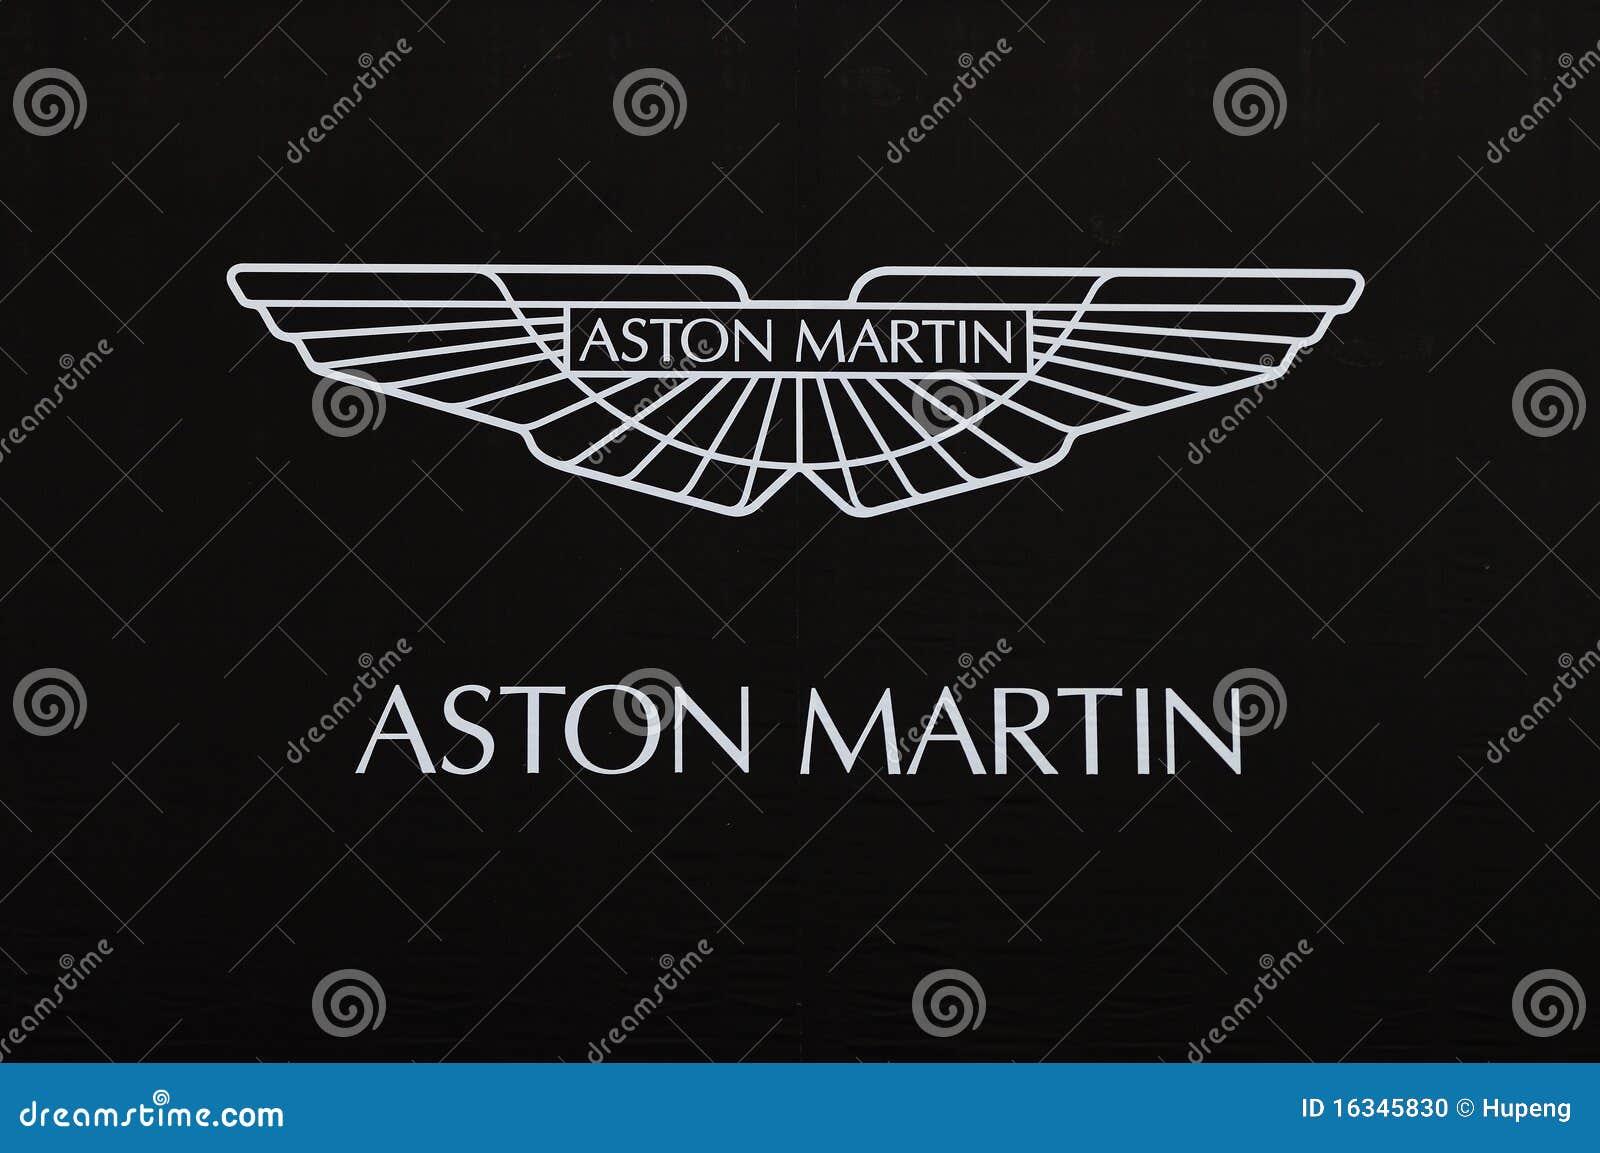 Aston Martin Logo Editorial Image Image Of Automotive 16345830